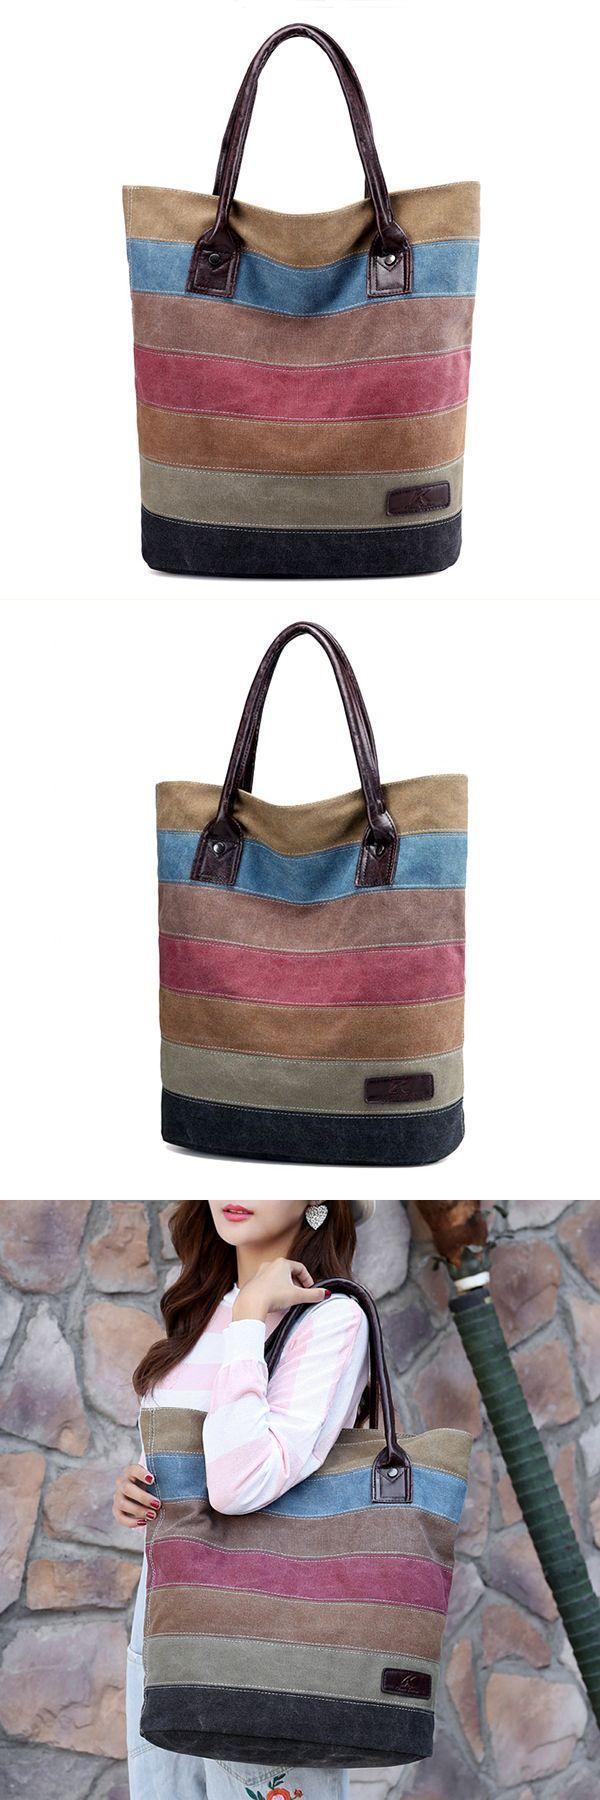 Triple 7 handbags women stripe leisure canvas tote handbags travel tote bags   86  handbags 4461dbfeae